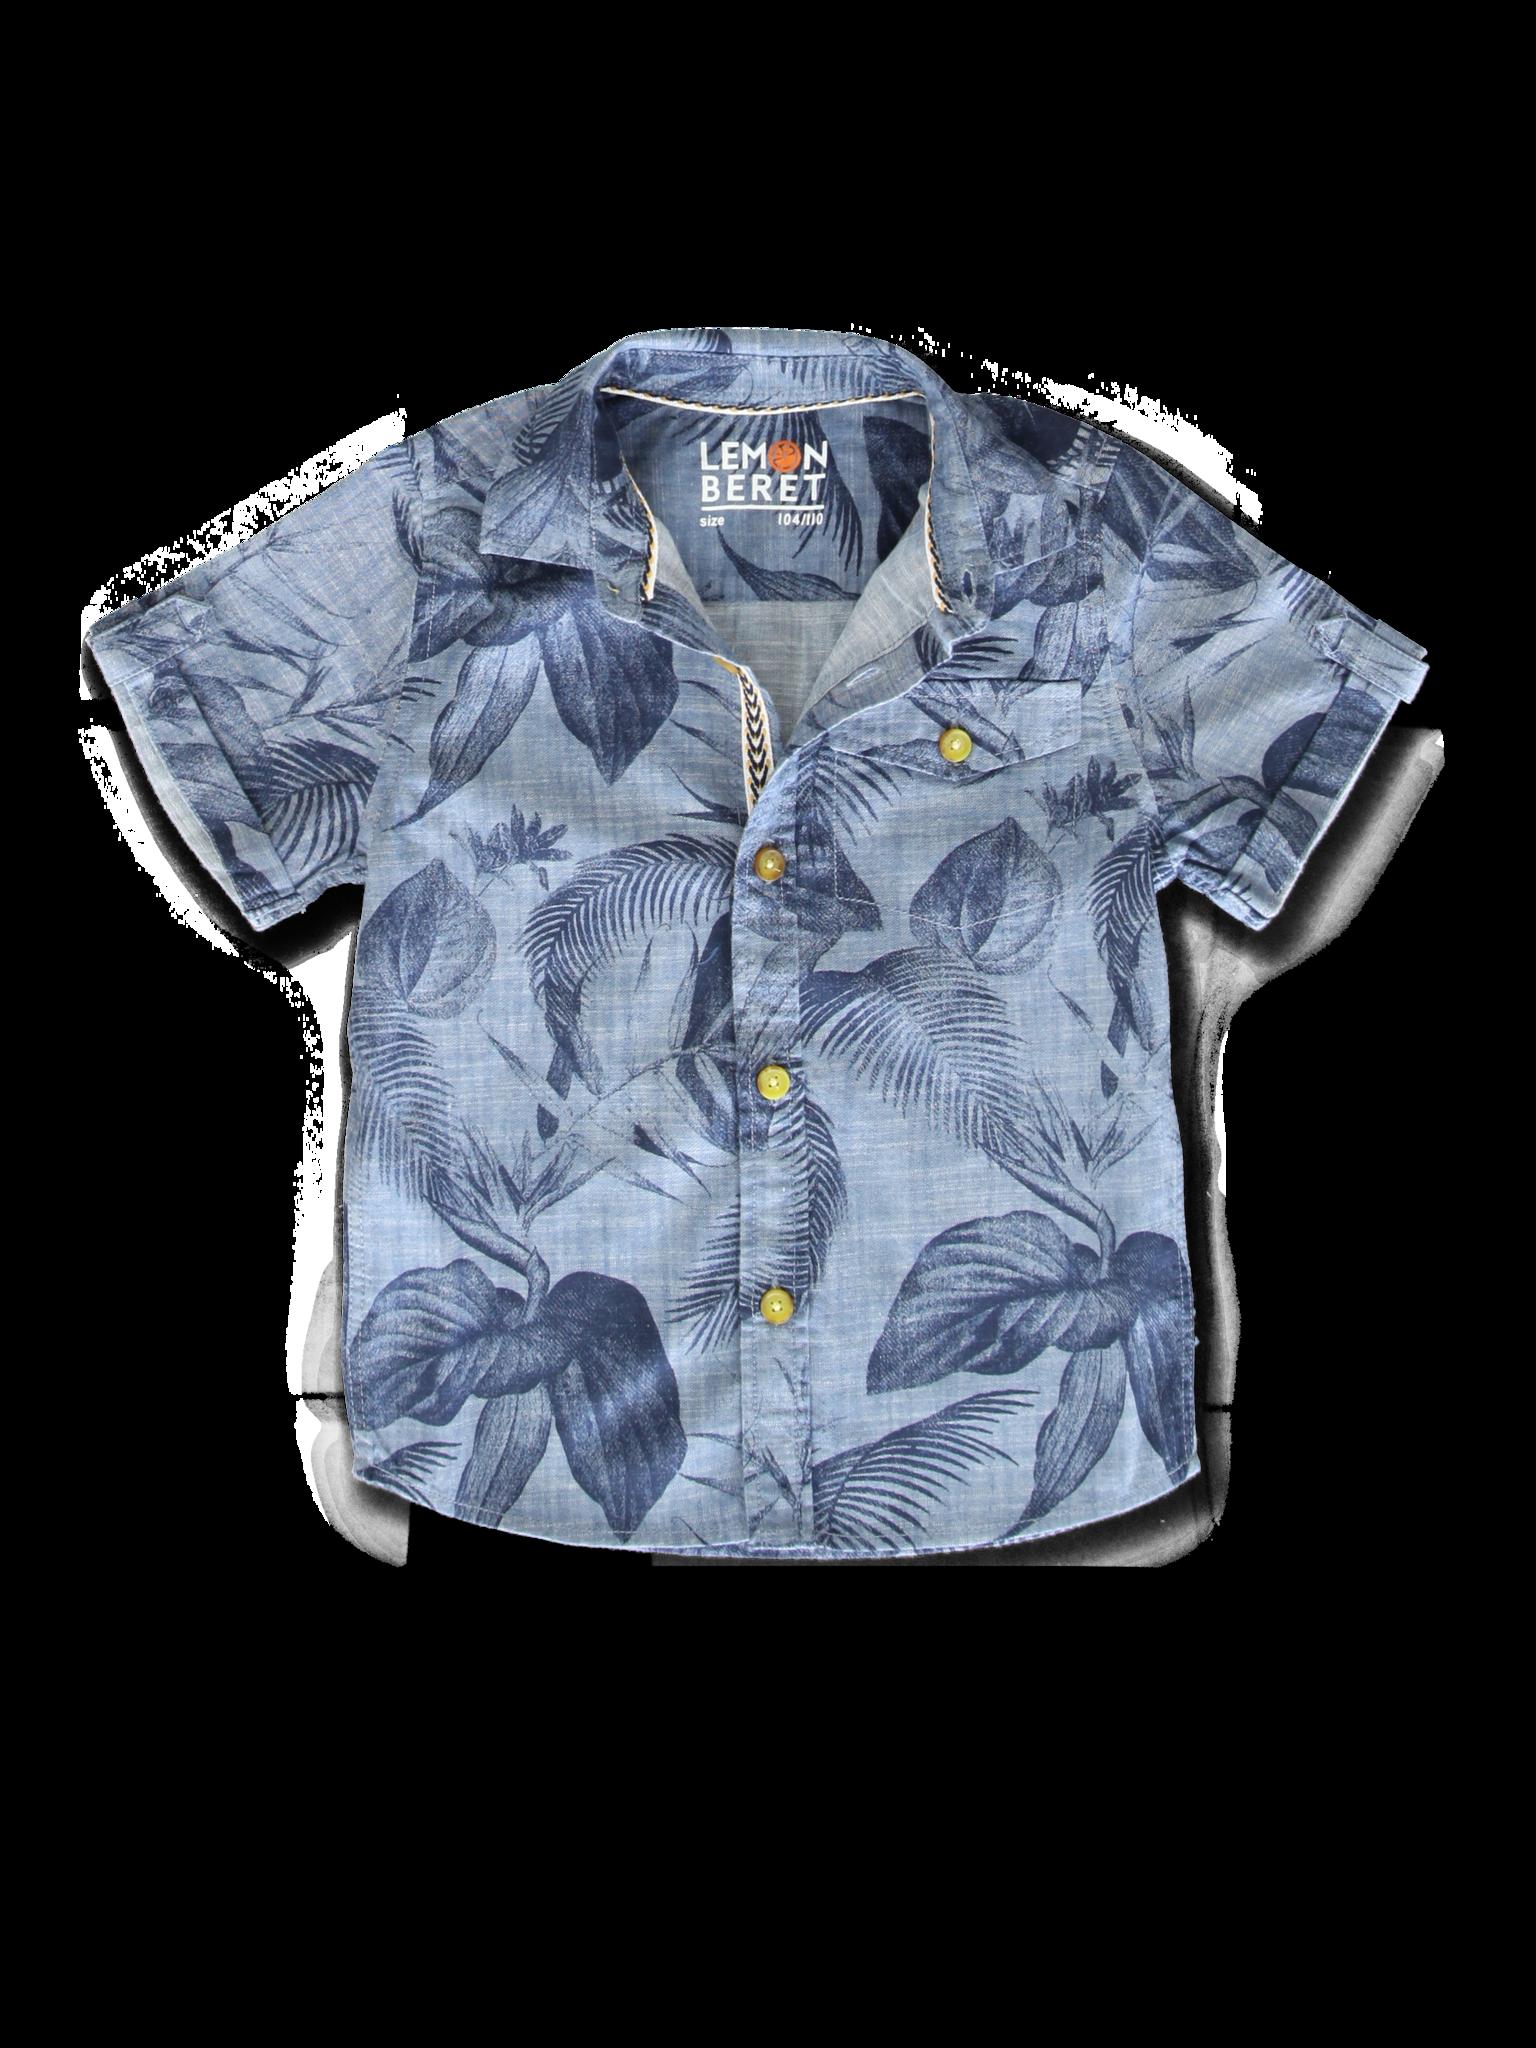 All Brands | Summerproducts Small Boys | Shirt | 10 pcs/box